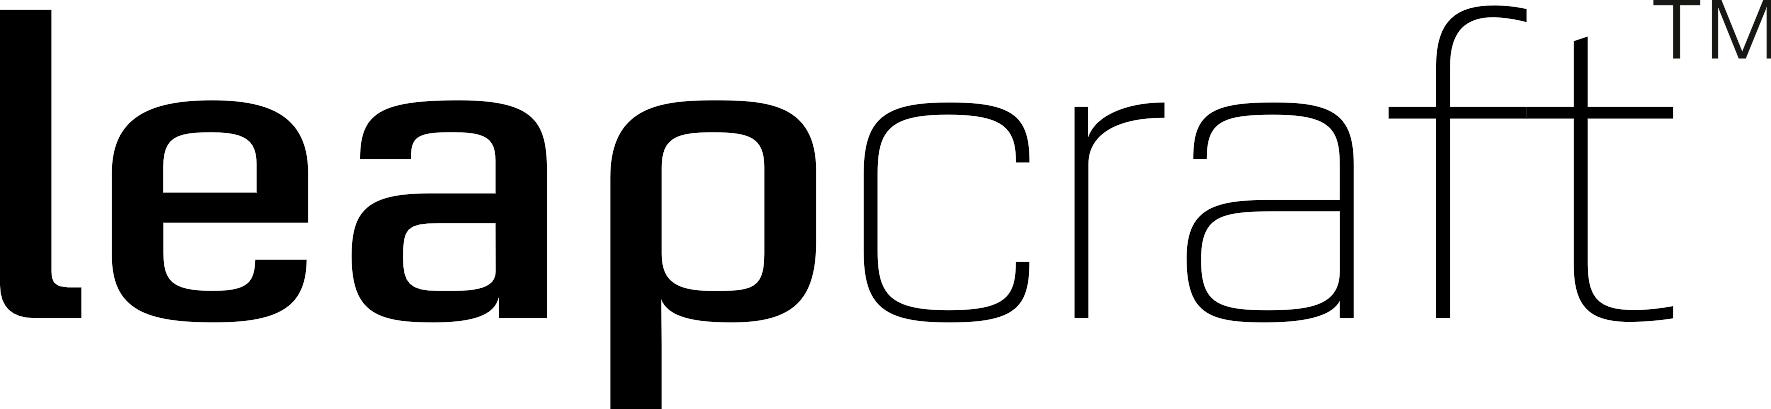 Leapcraft-logo